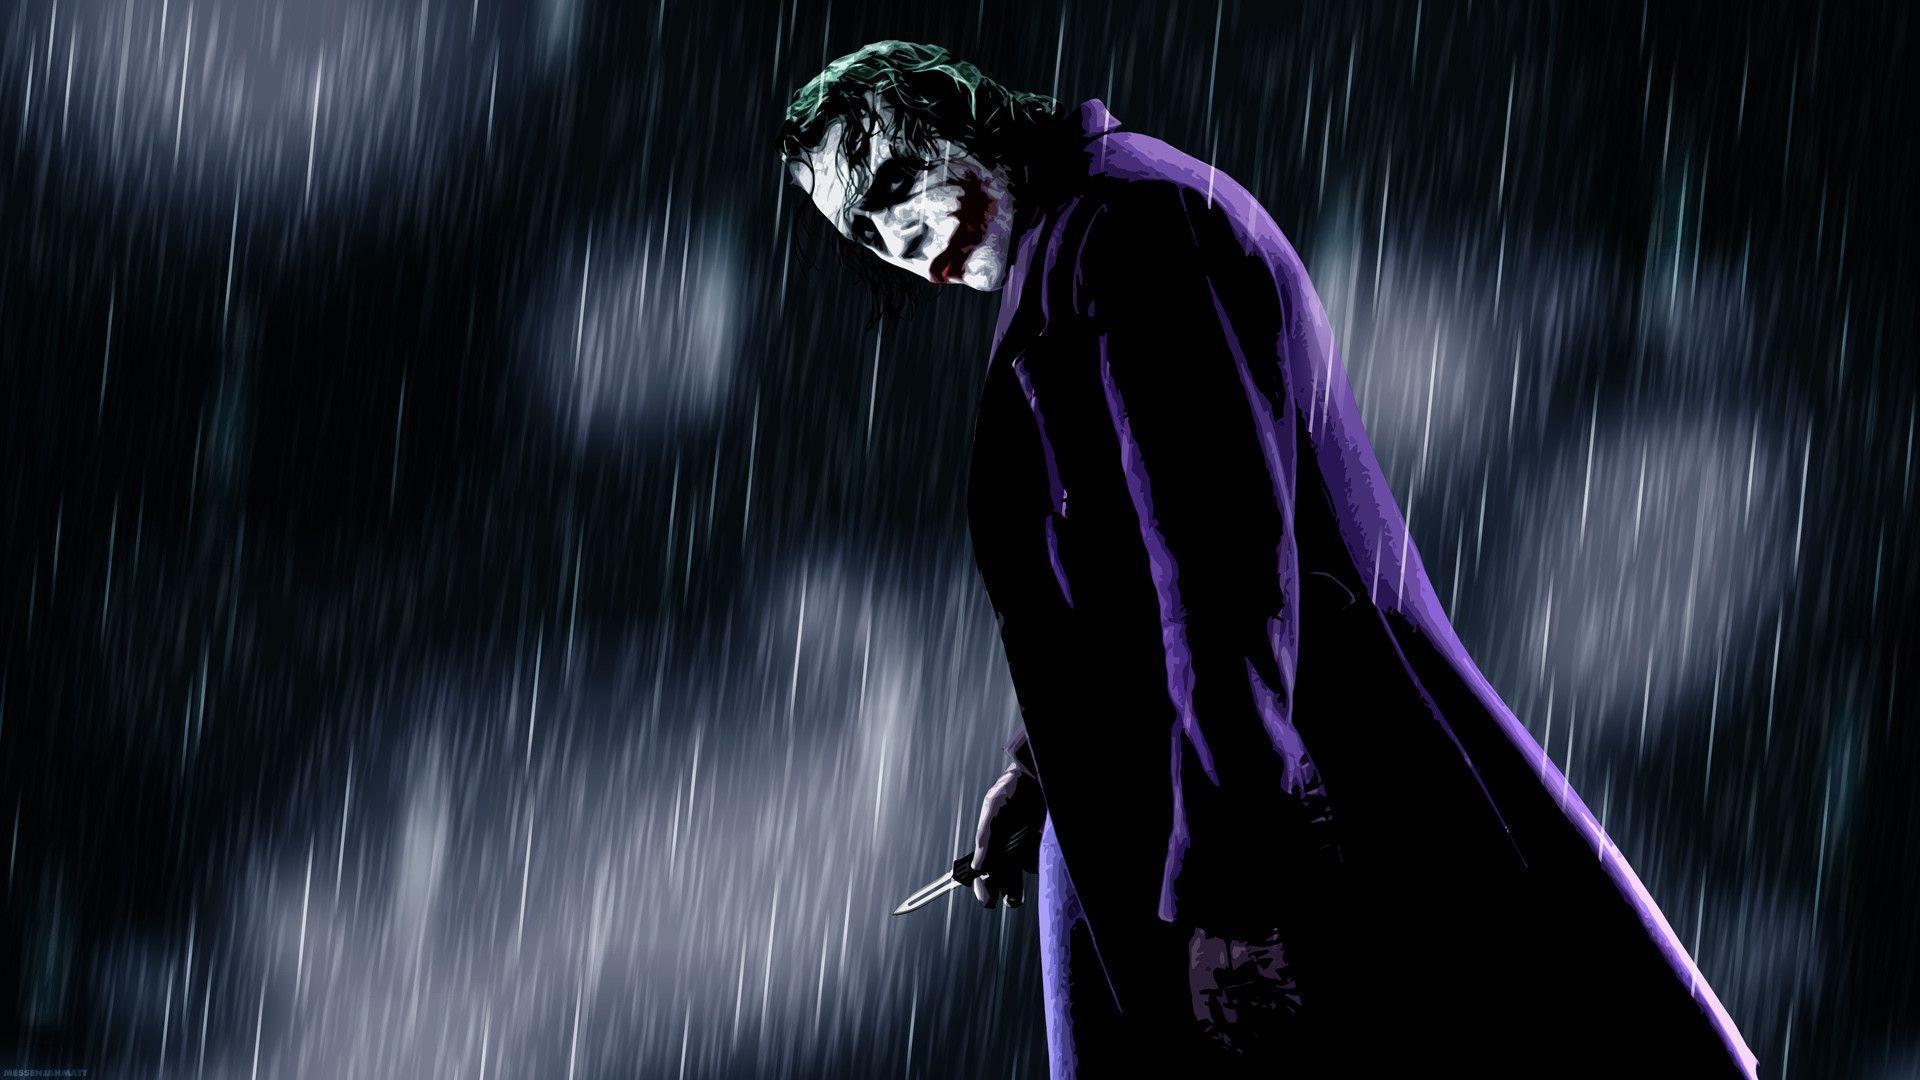 Joker Desktop Backgrounds - Wallpaper Cave